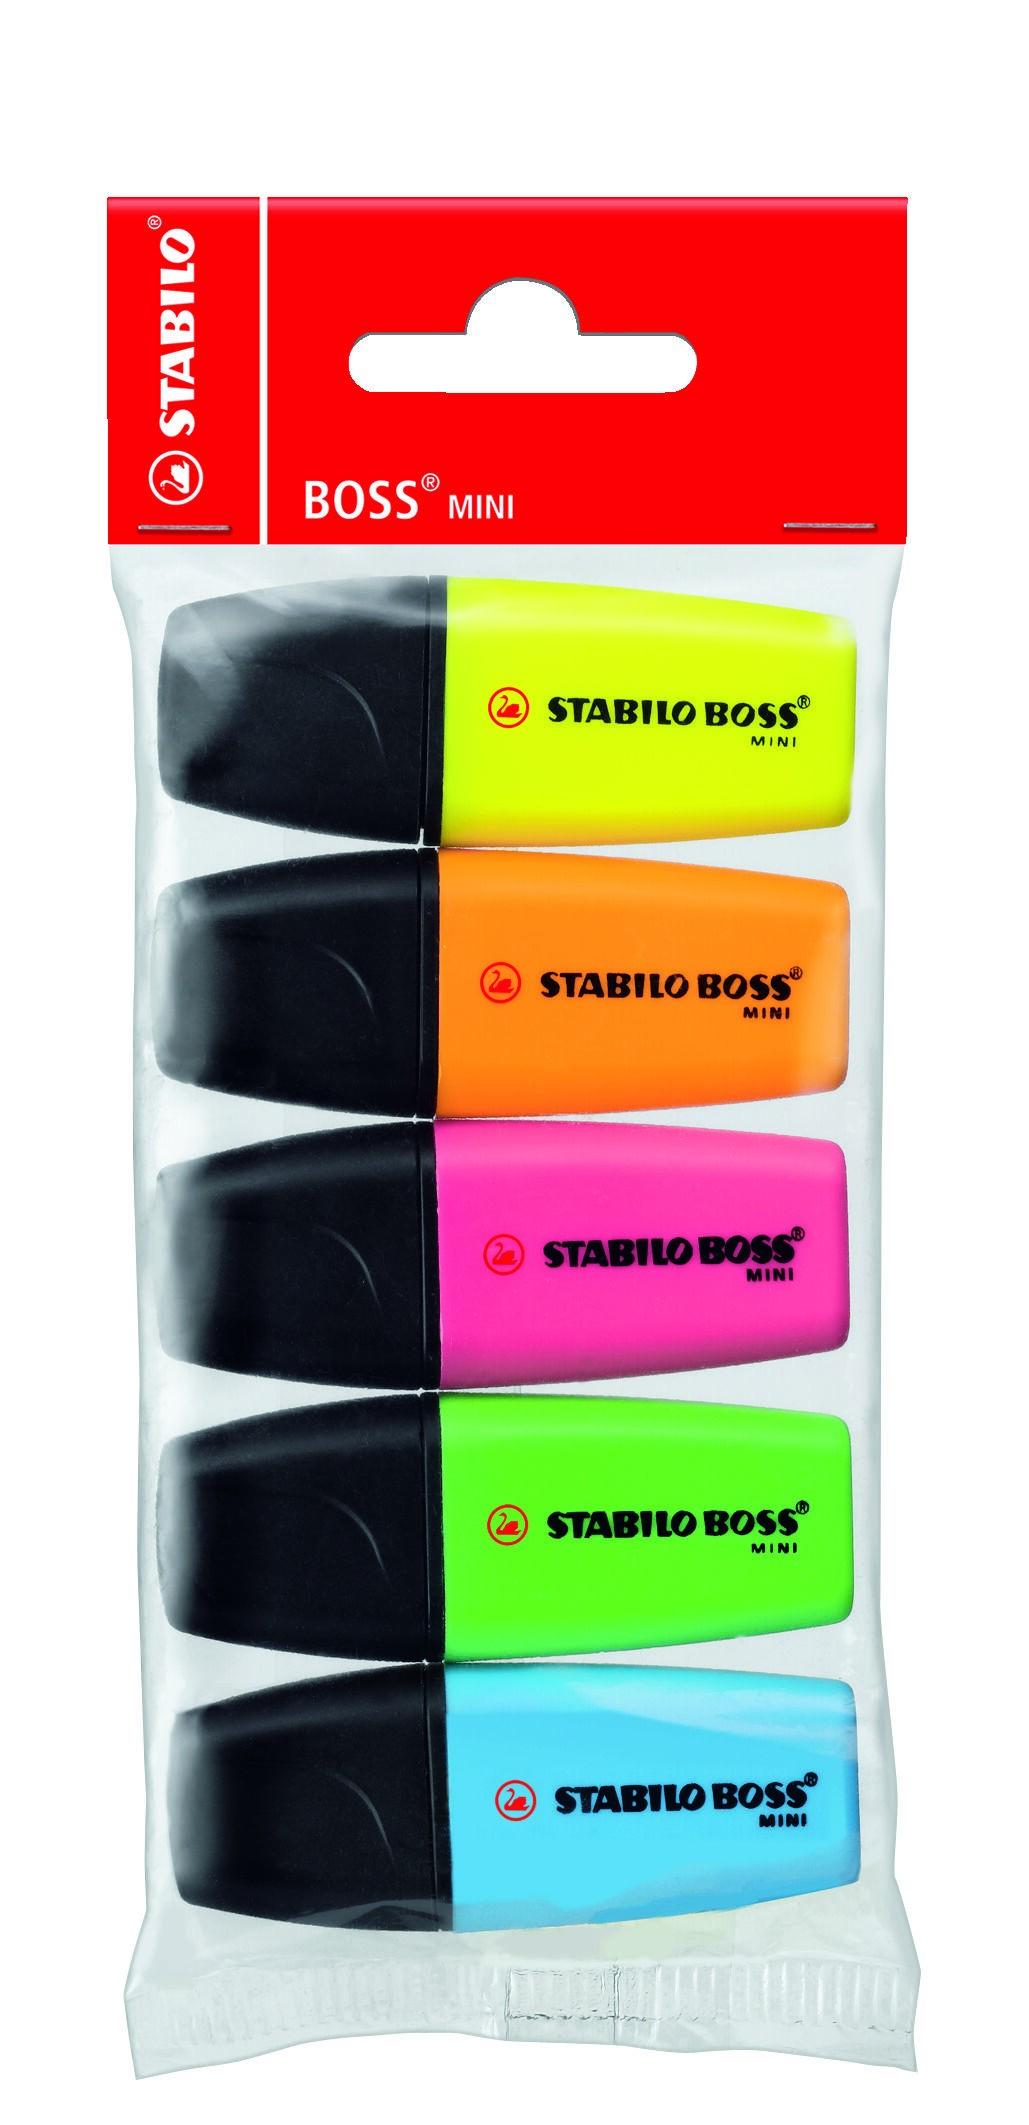 STABILO BOSS MINI - Pack de 5 surligneurs - couleurs assorties